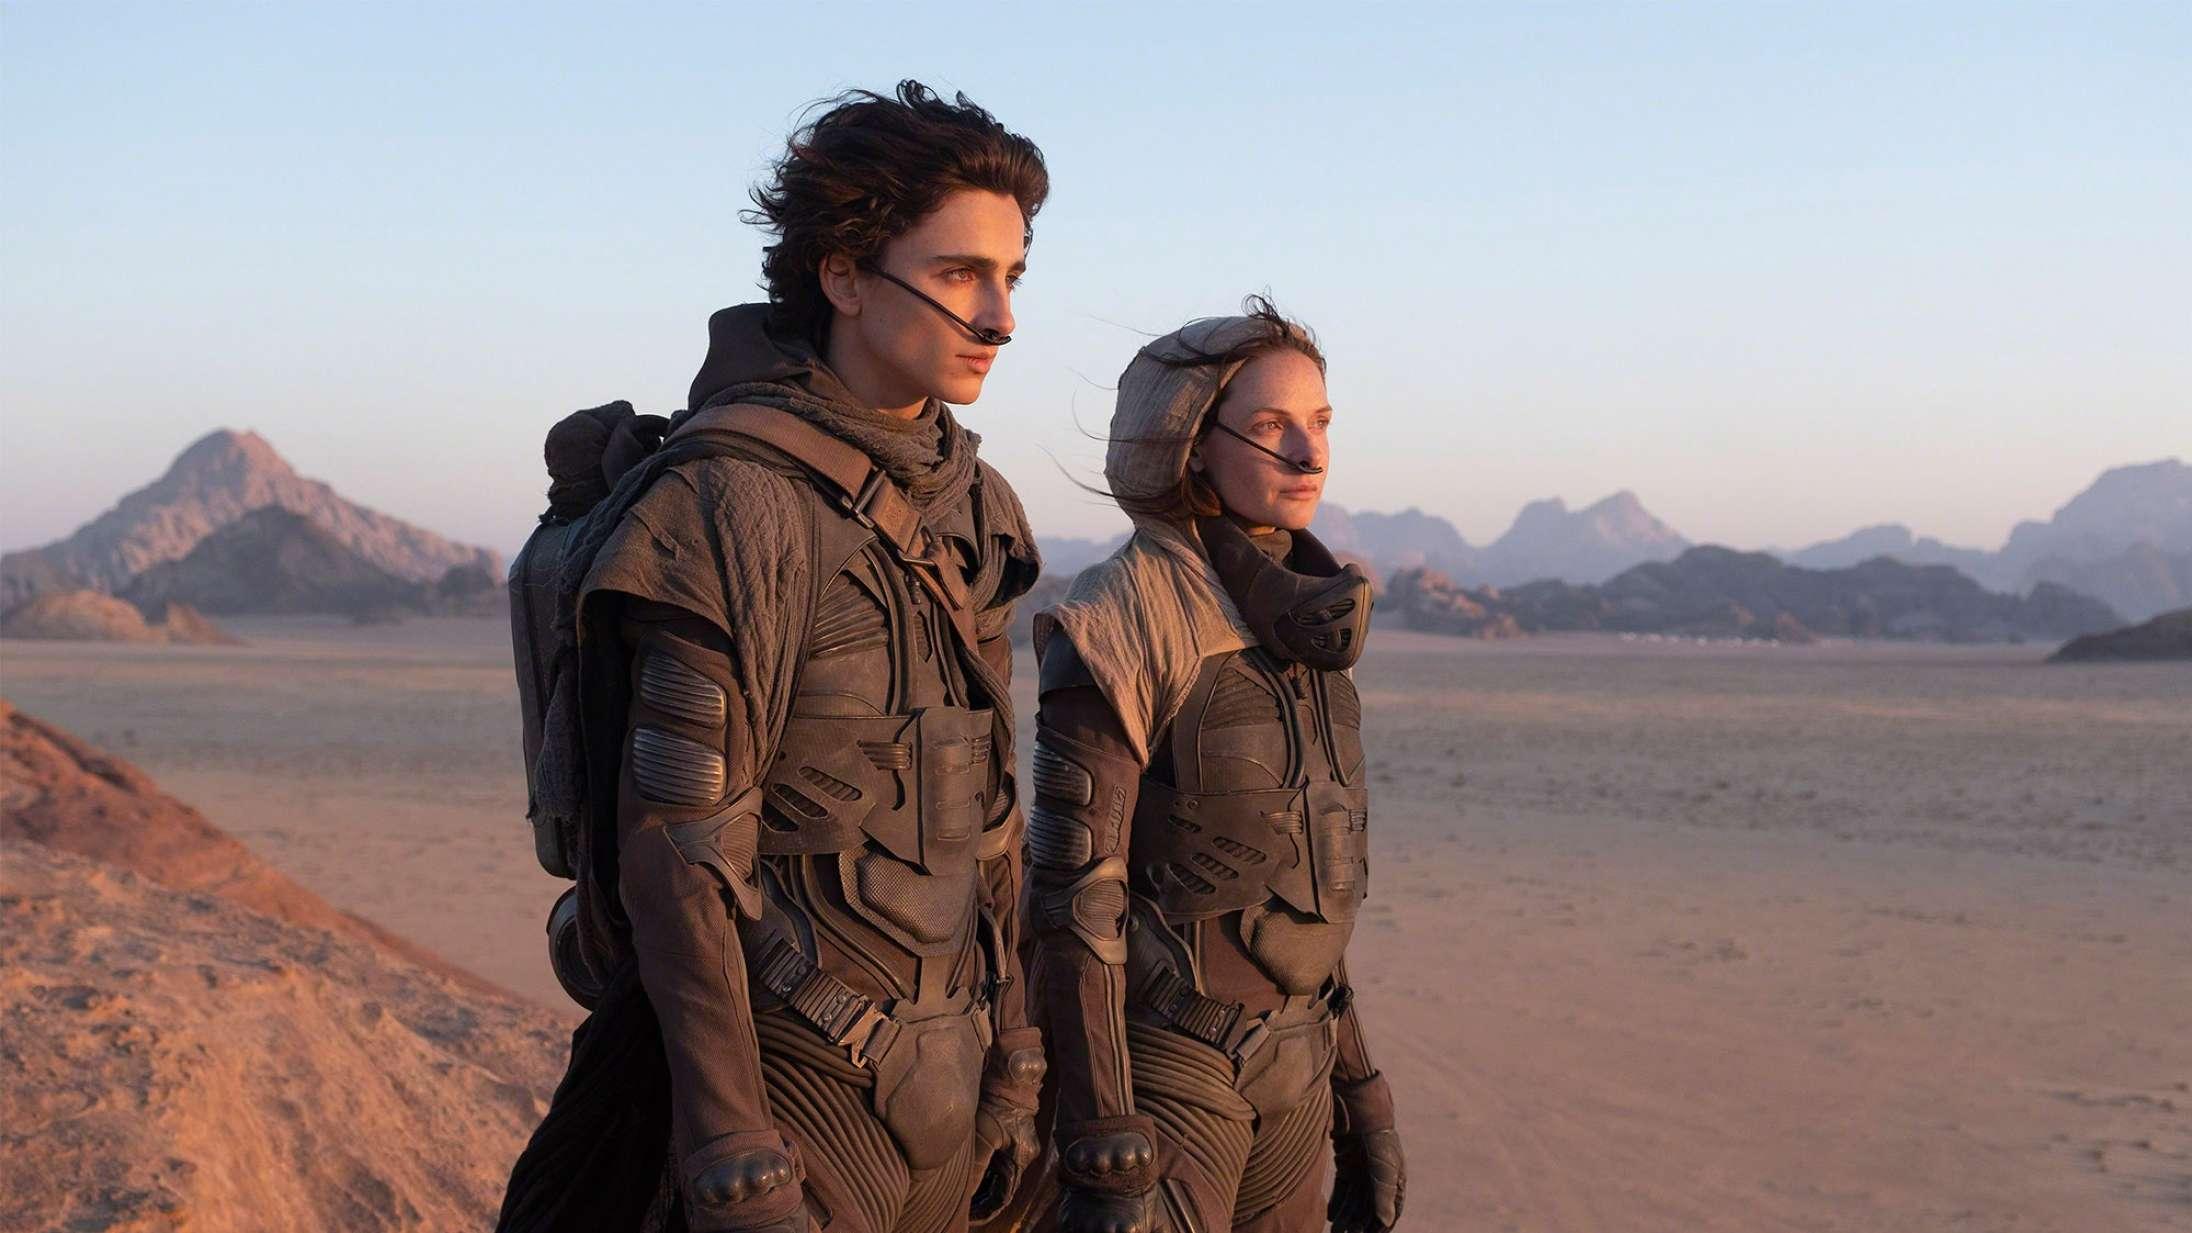 Ja, 'Dune' kommer i biografen og på streaming samtidig – i hvert fald i USA